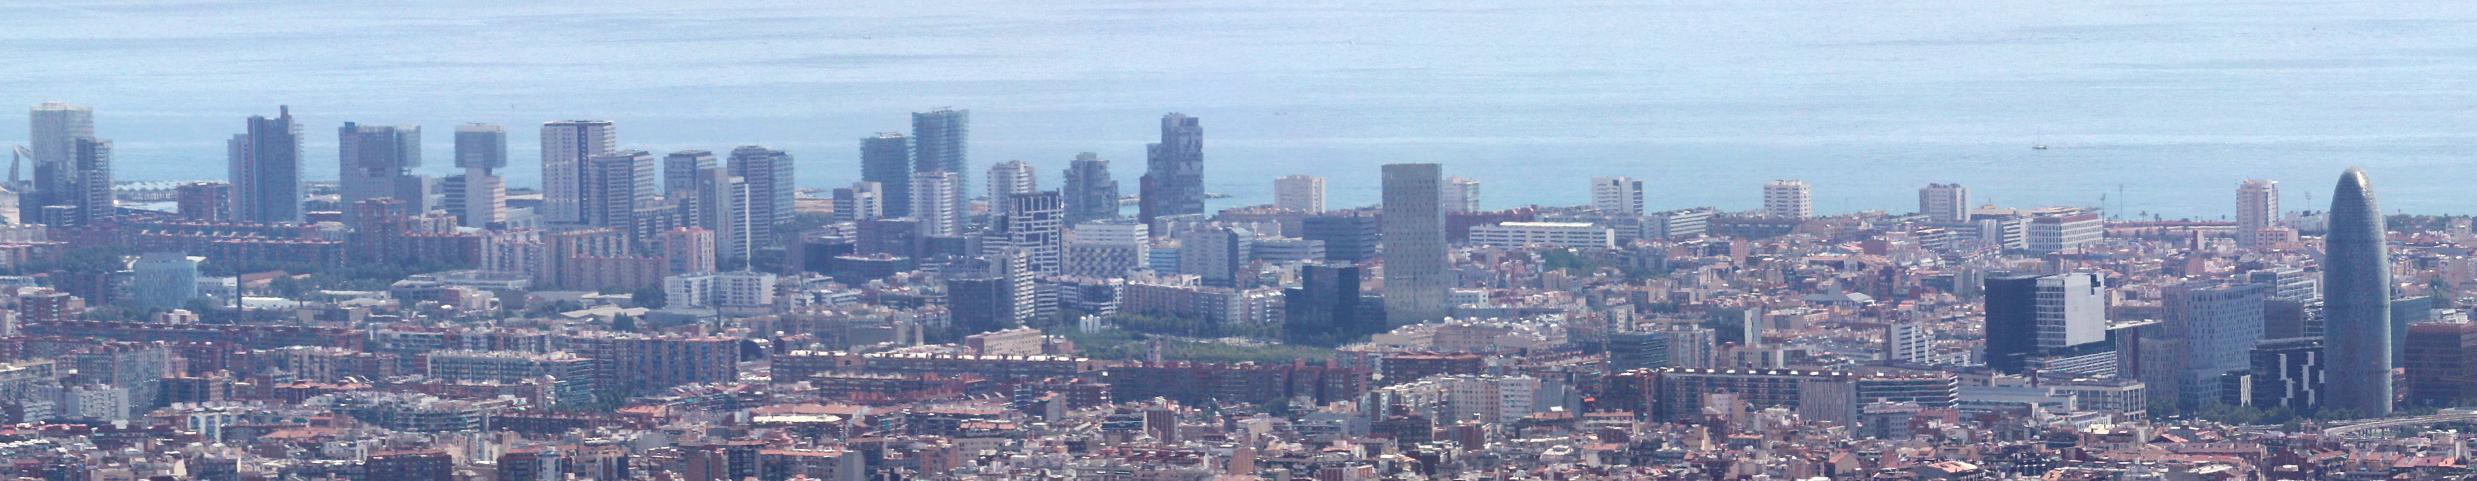 https://i2.wp.com/upload.wikimedia.org/wikipedia/commons/3/3c/Skyscrapers_in_Diagonal_Mar%2C_Barcelona.jpg